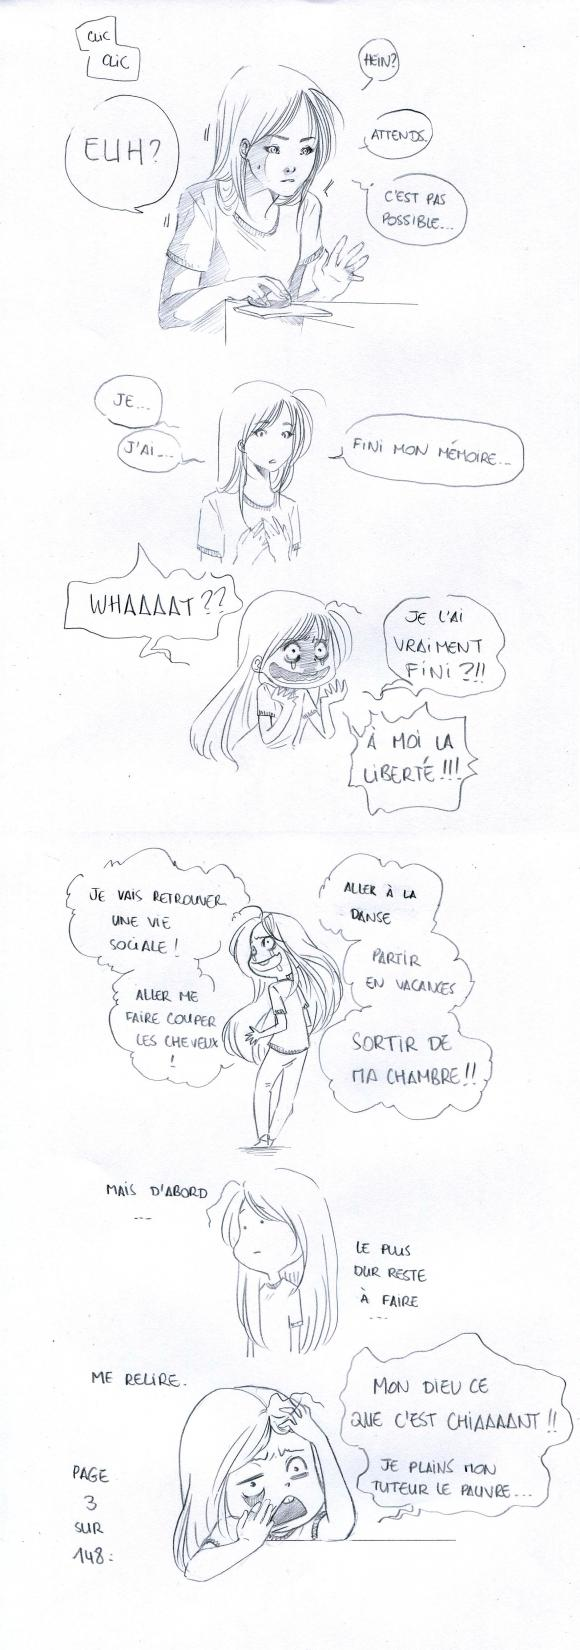 http://laceliah.cowblog.fr/images/Striplife/Memoir.jpg